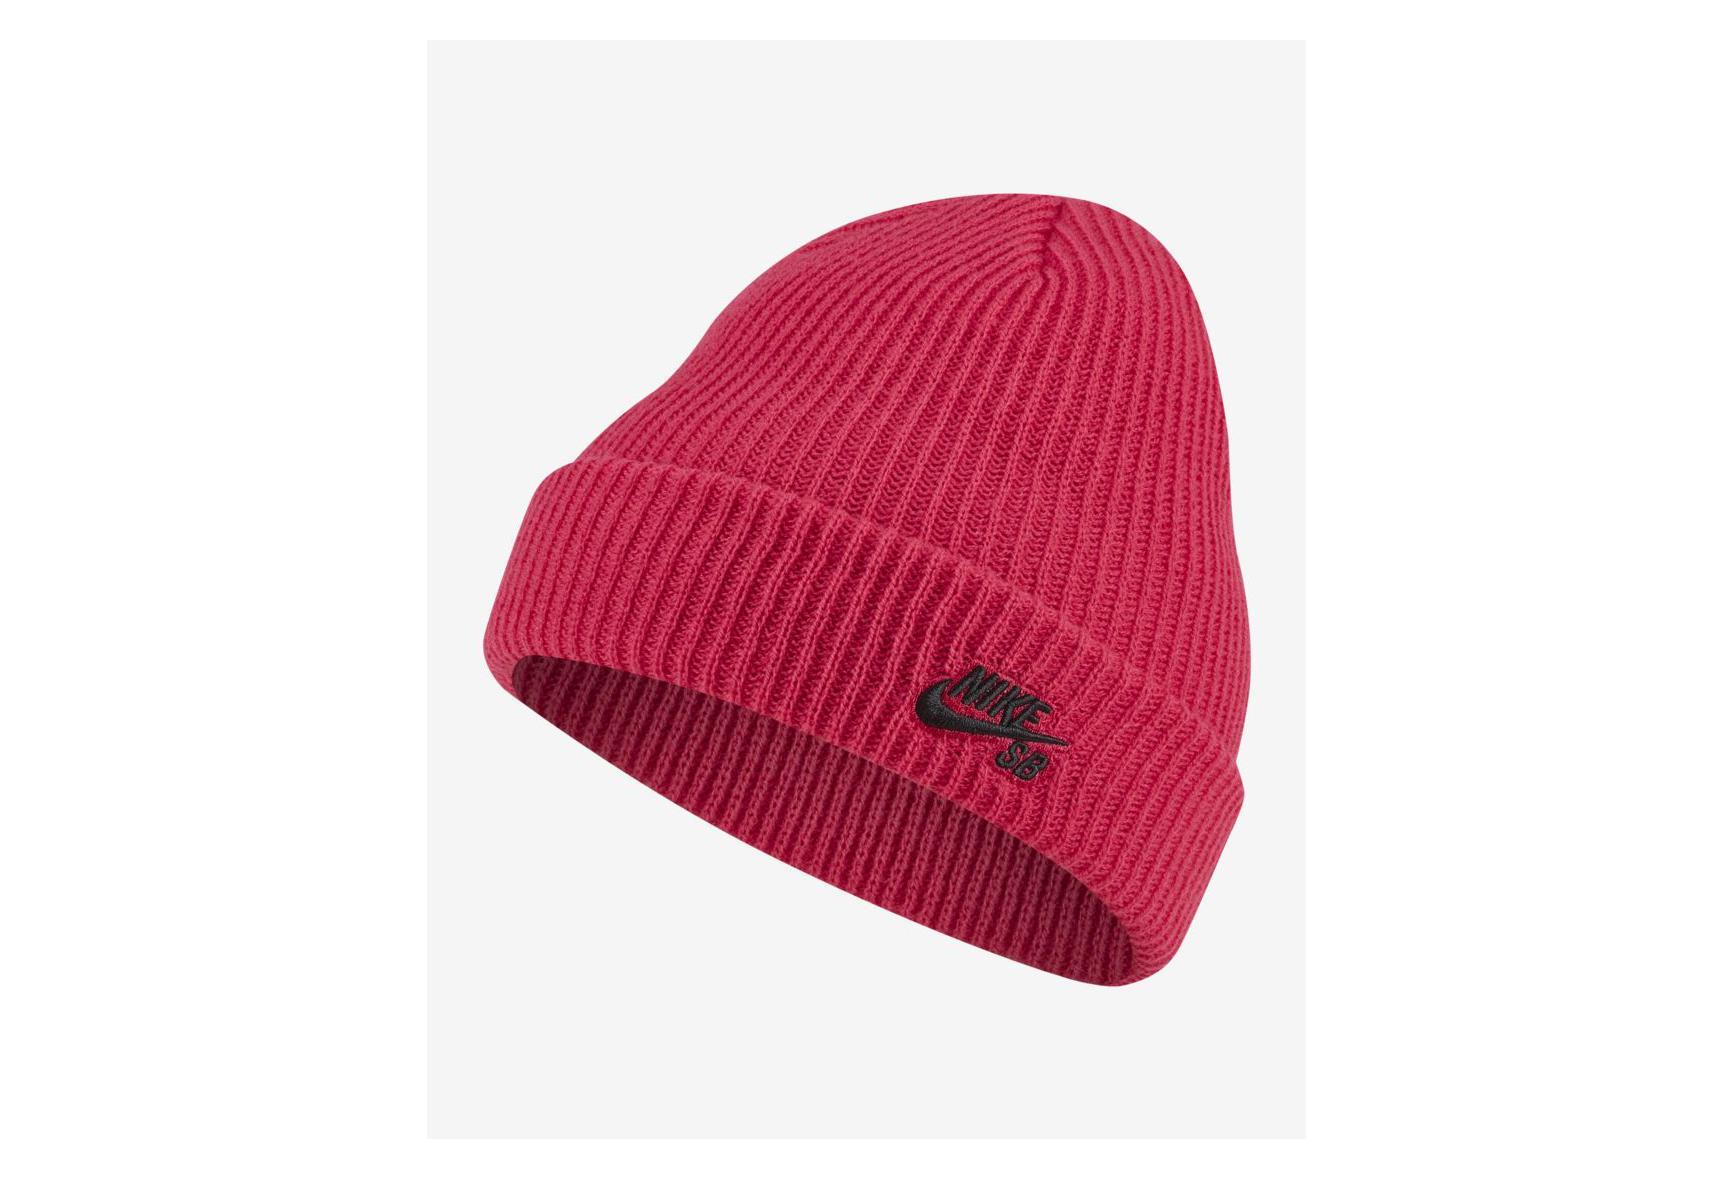 9349de2c8 Nike SB Fisherman Cap Pink / Black